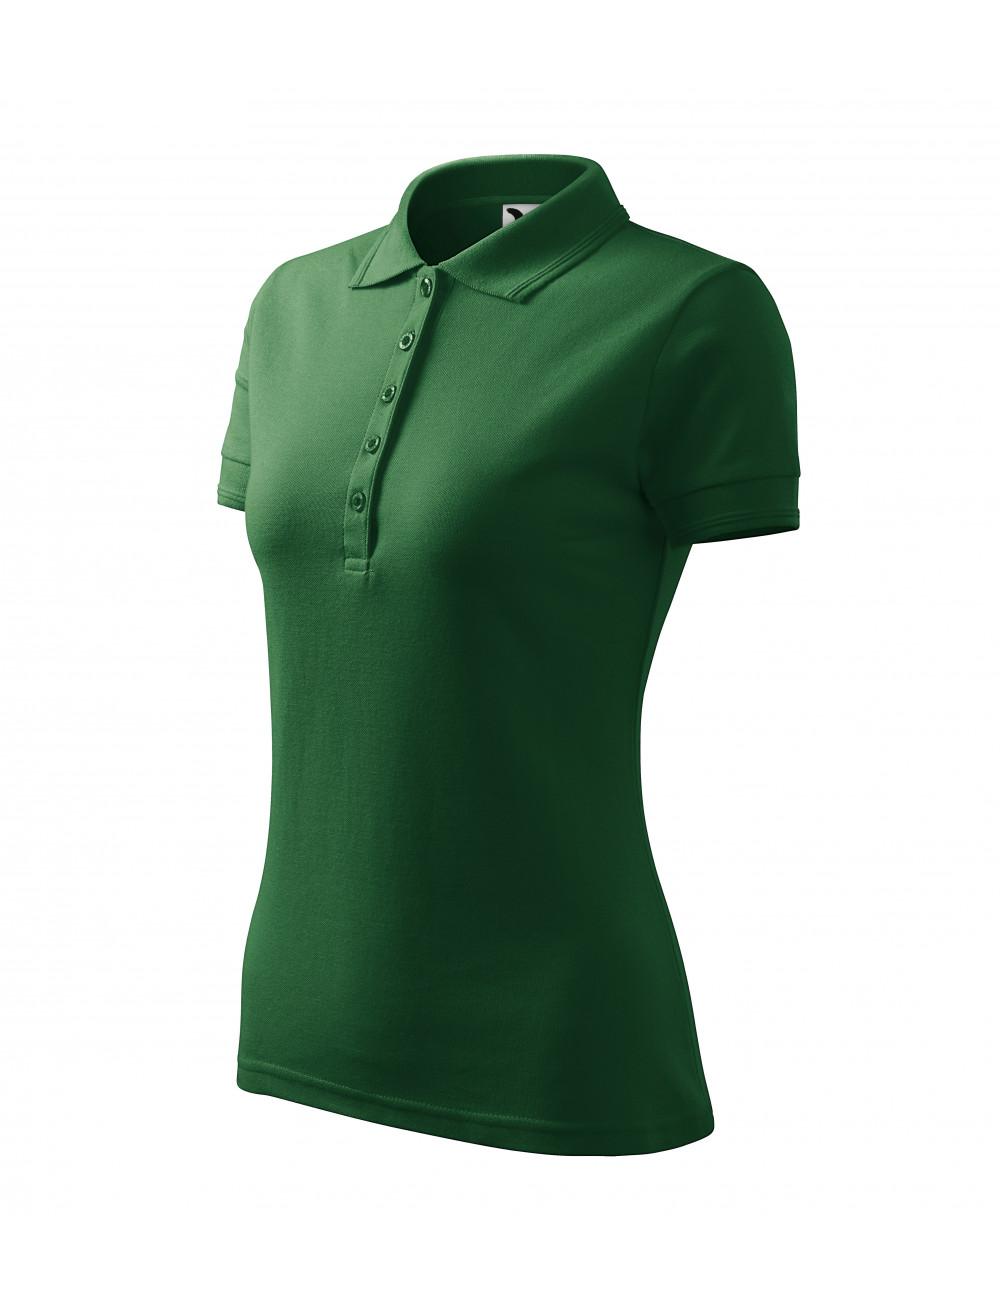 Adler MALFINI Koszulka polo damska Pique Polo 210 zieleń butelkowa